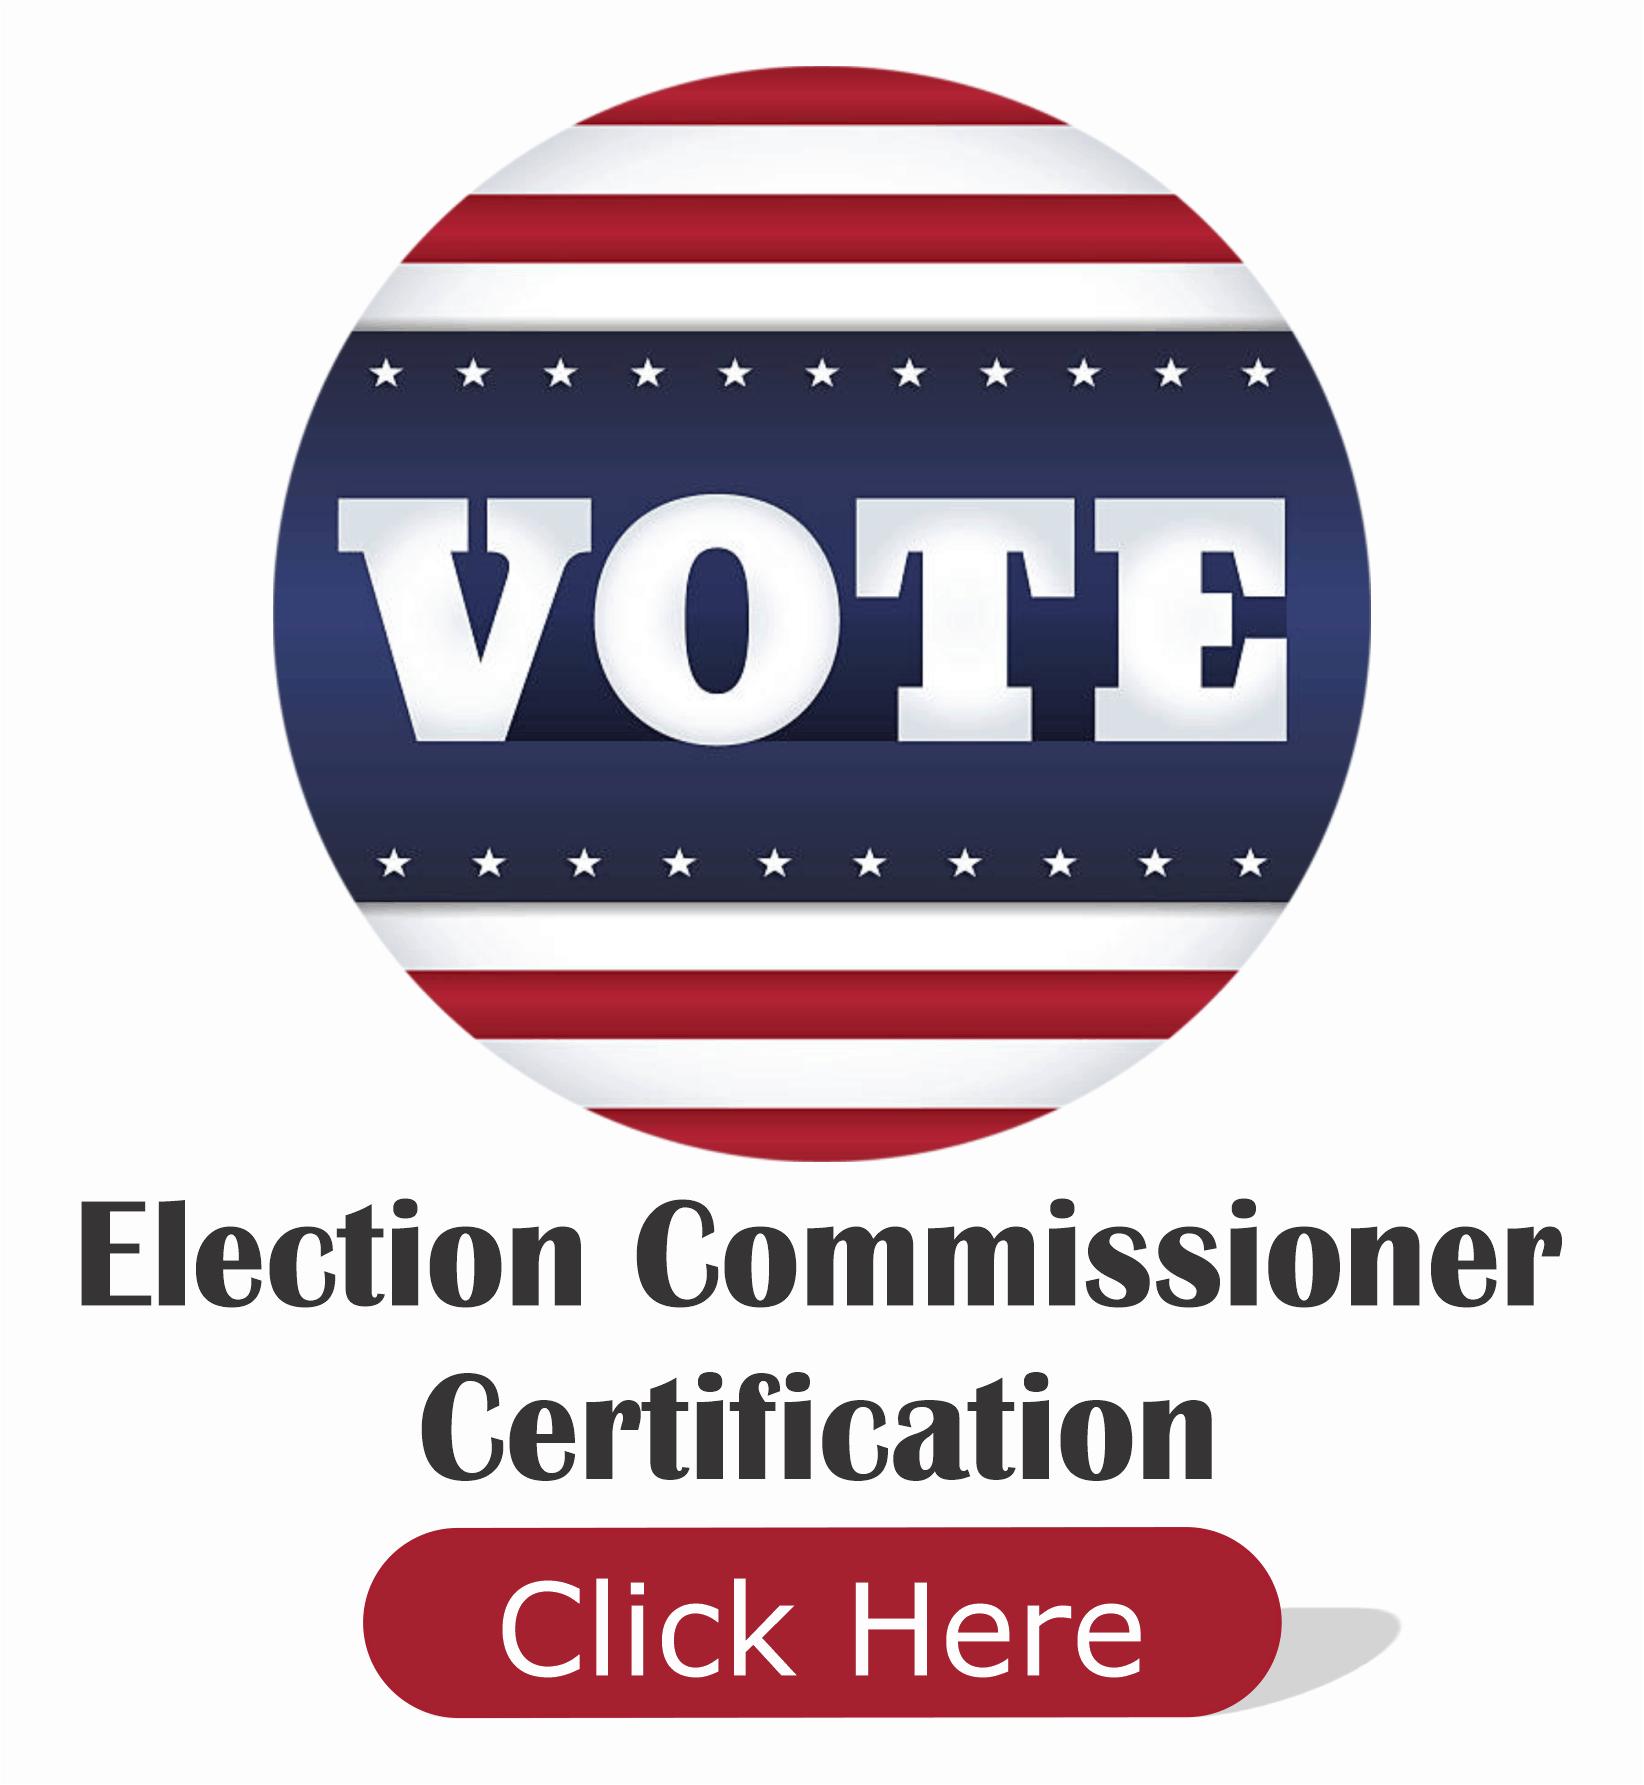 Commissioner Certification